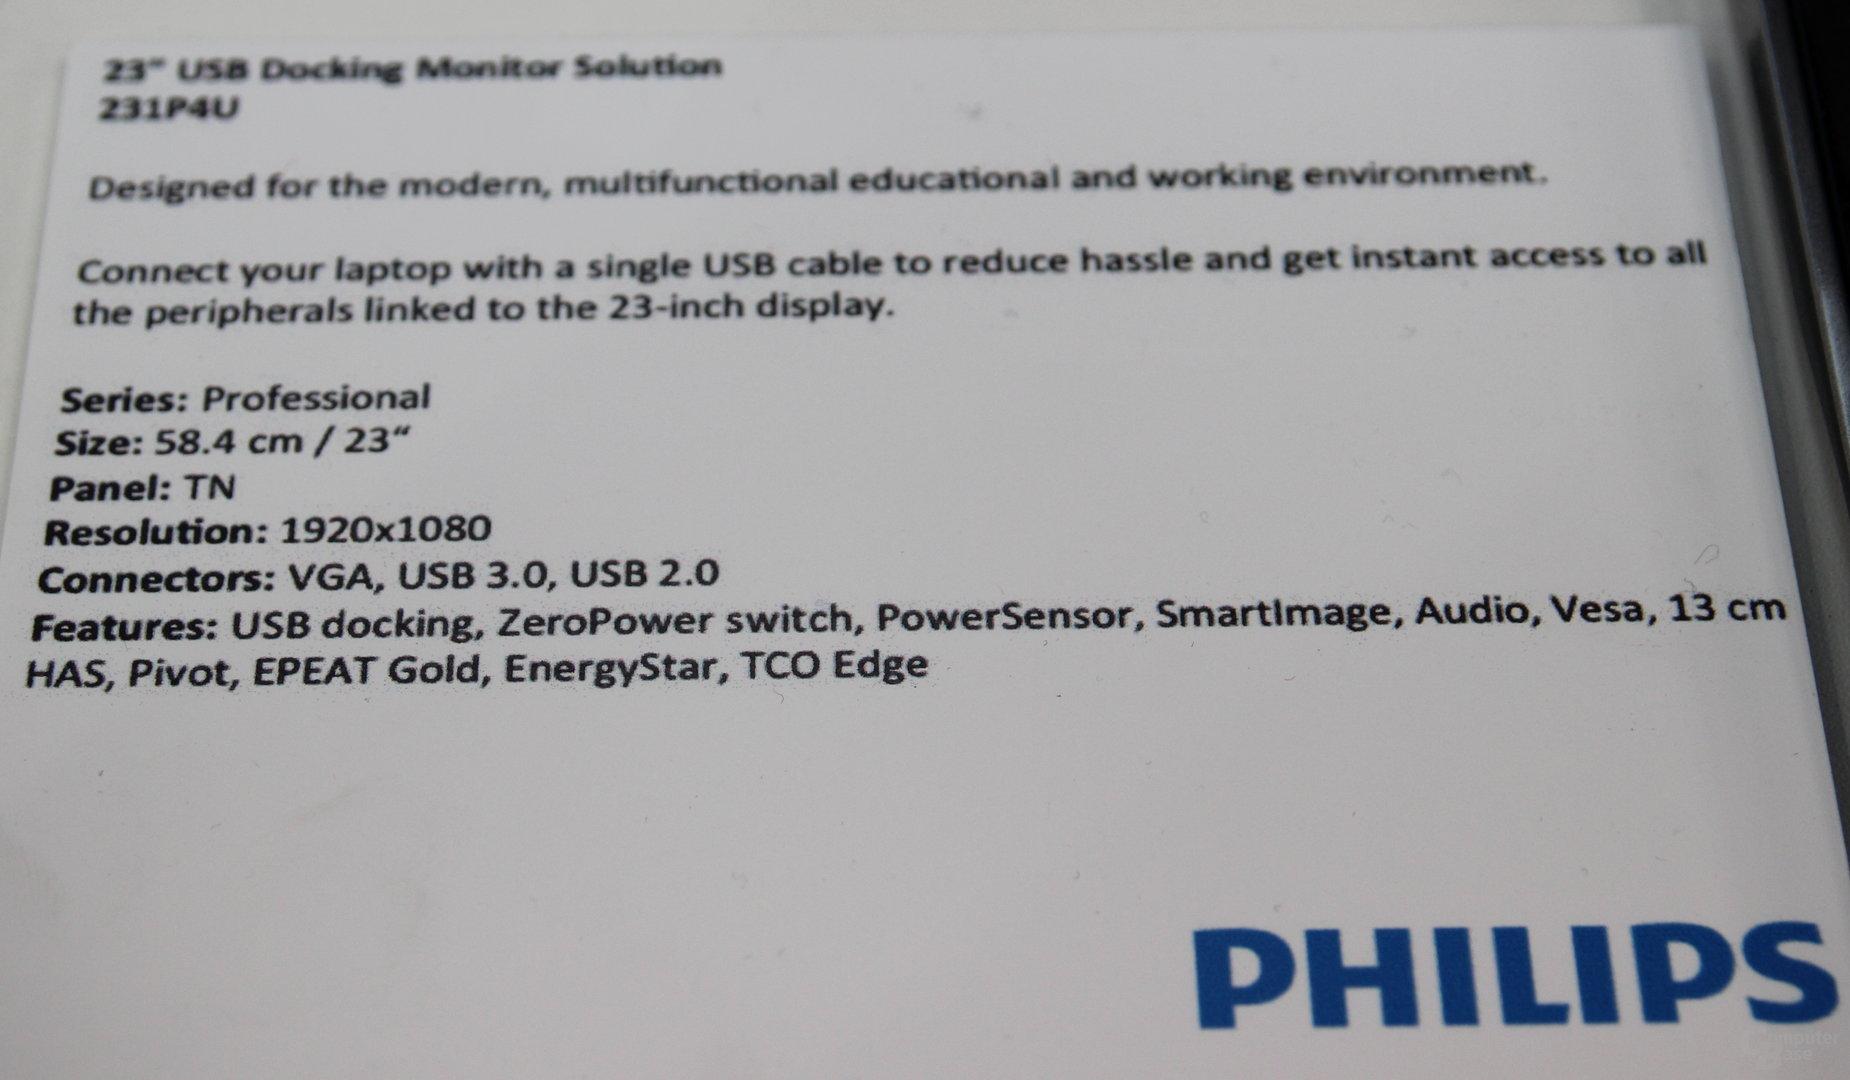 Philips 231P4U